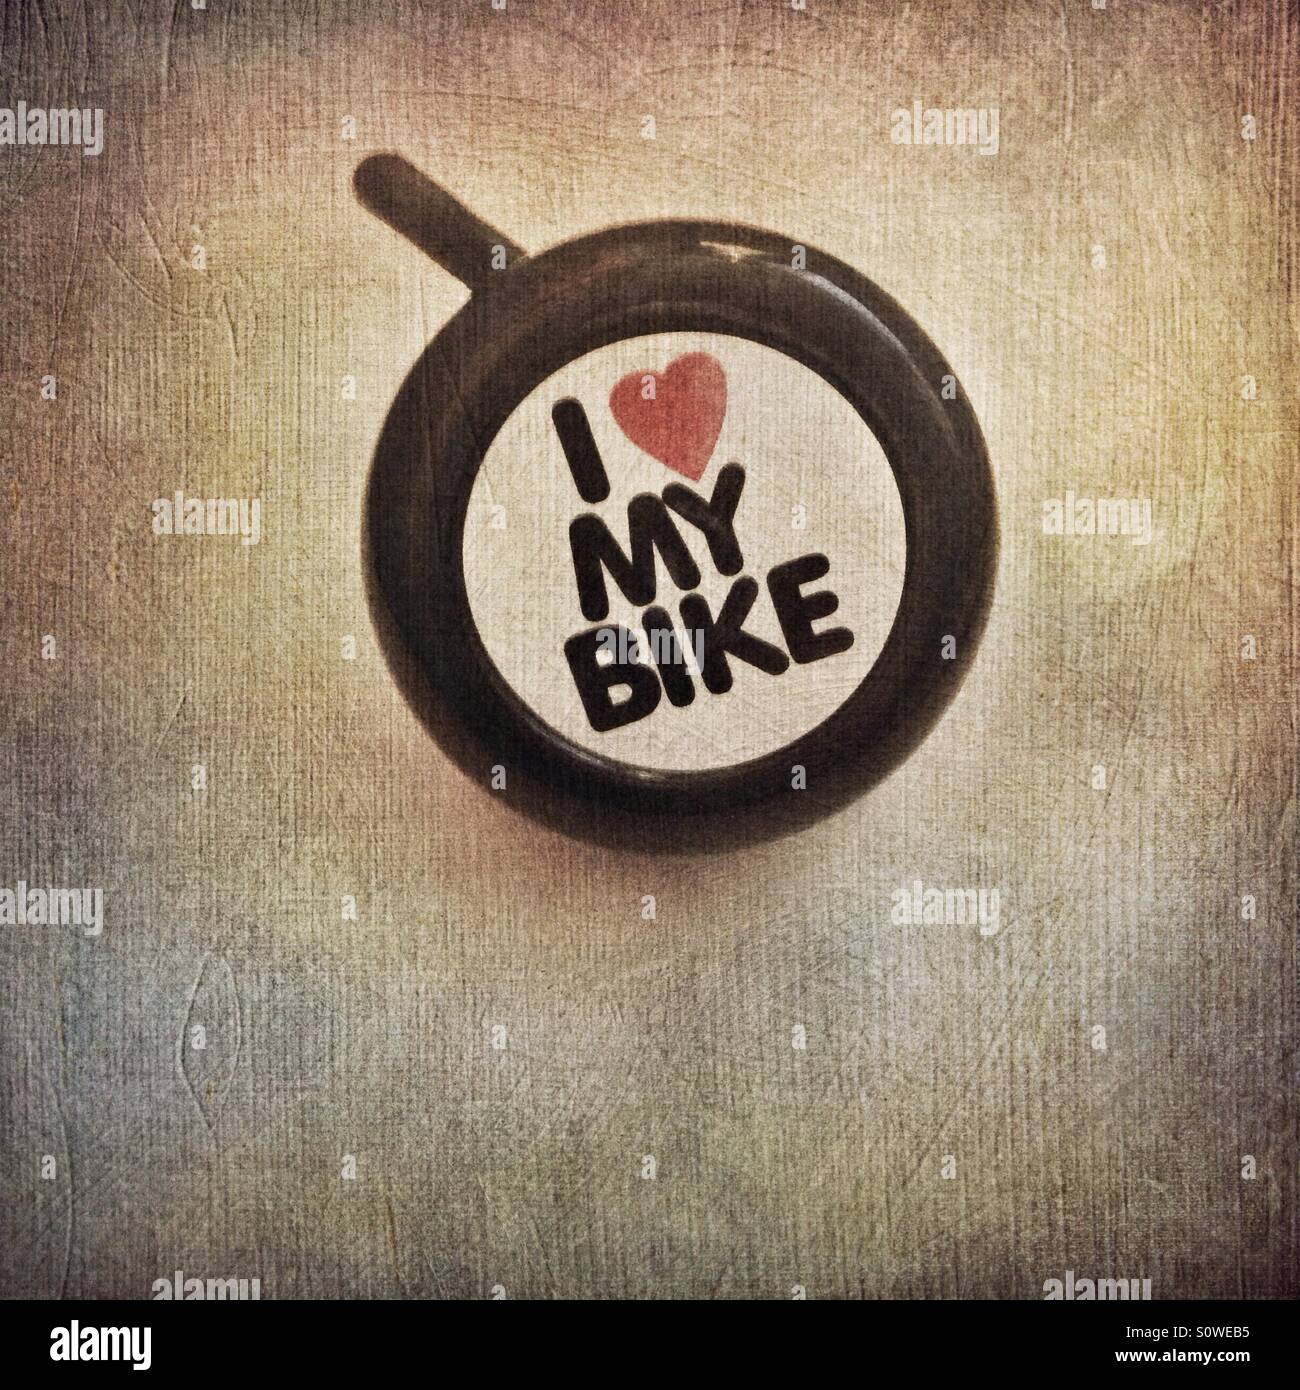 Bike Bell - Stock Image